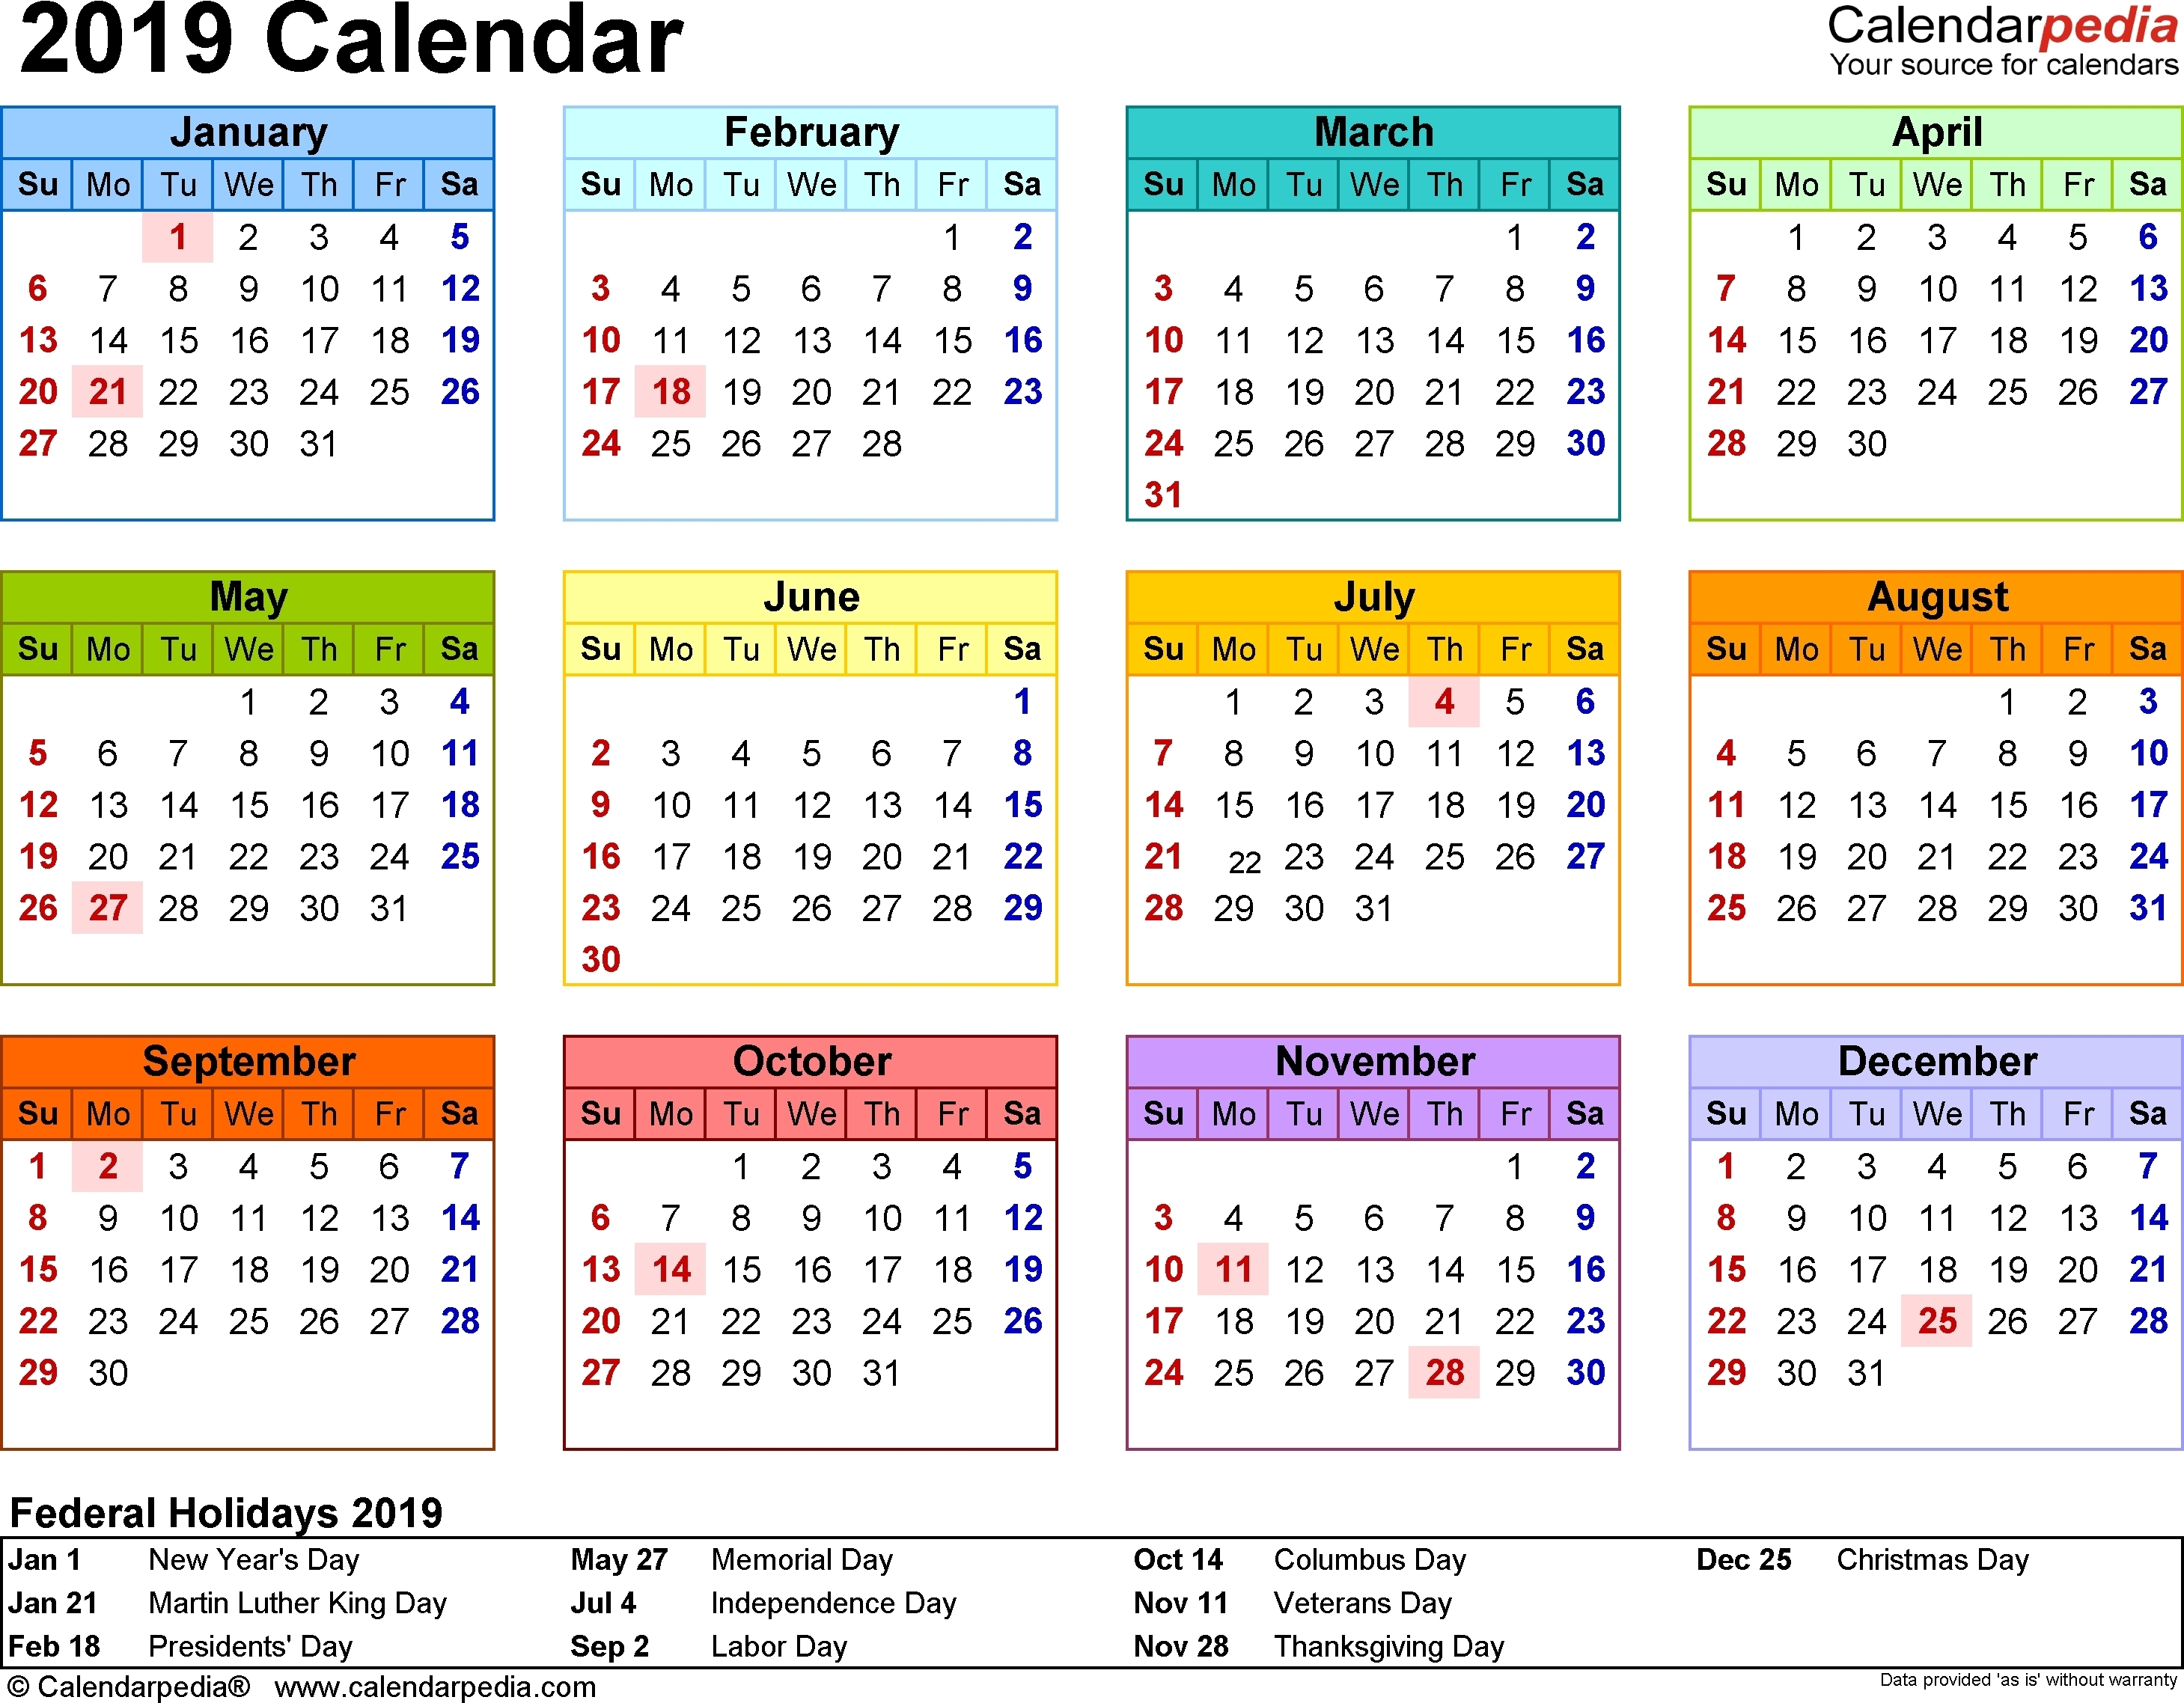 Holidays For 2020 South Africa | Calendar Template Printable-Sa Calendar With Public Holidays 2020